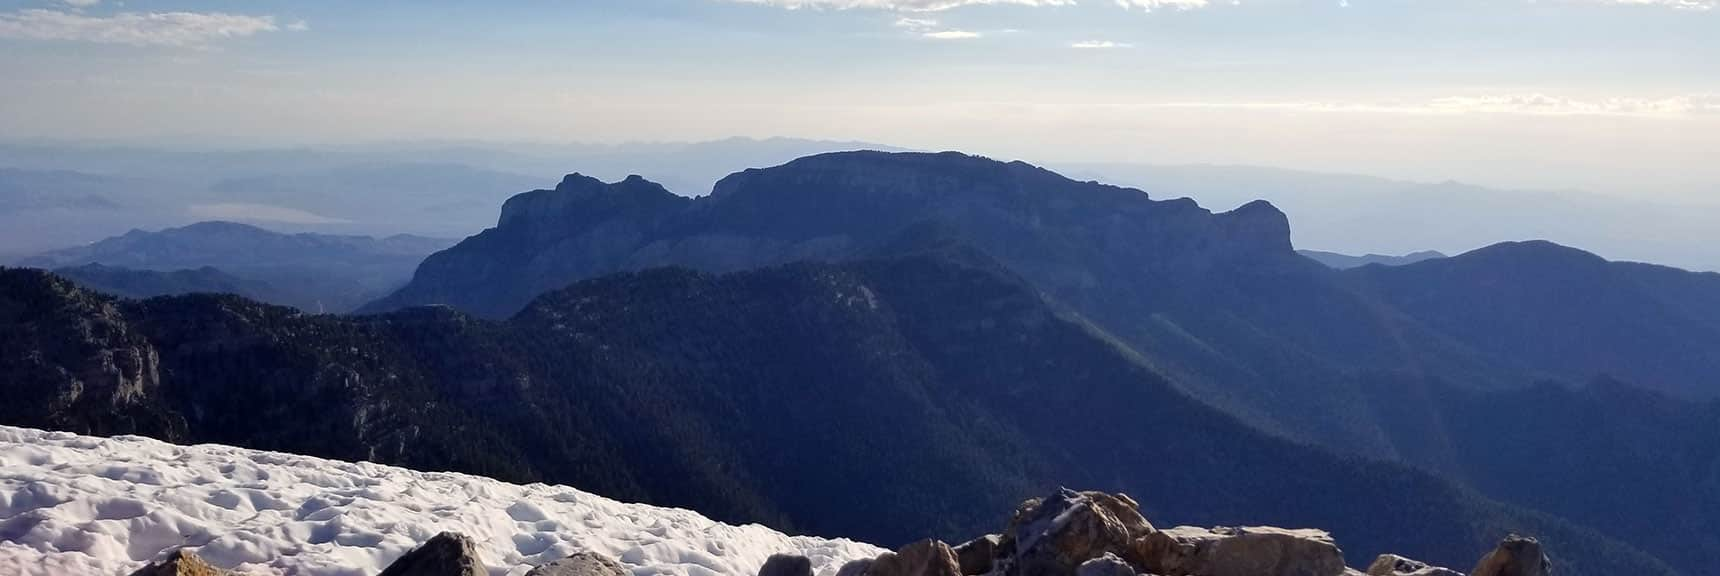 Mummy Mountain Silhouette from Charleston Peak Summit